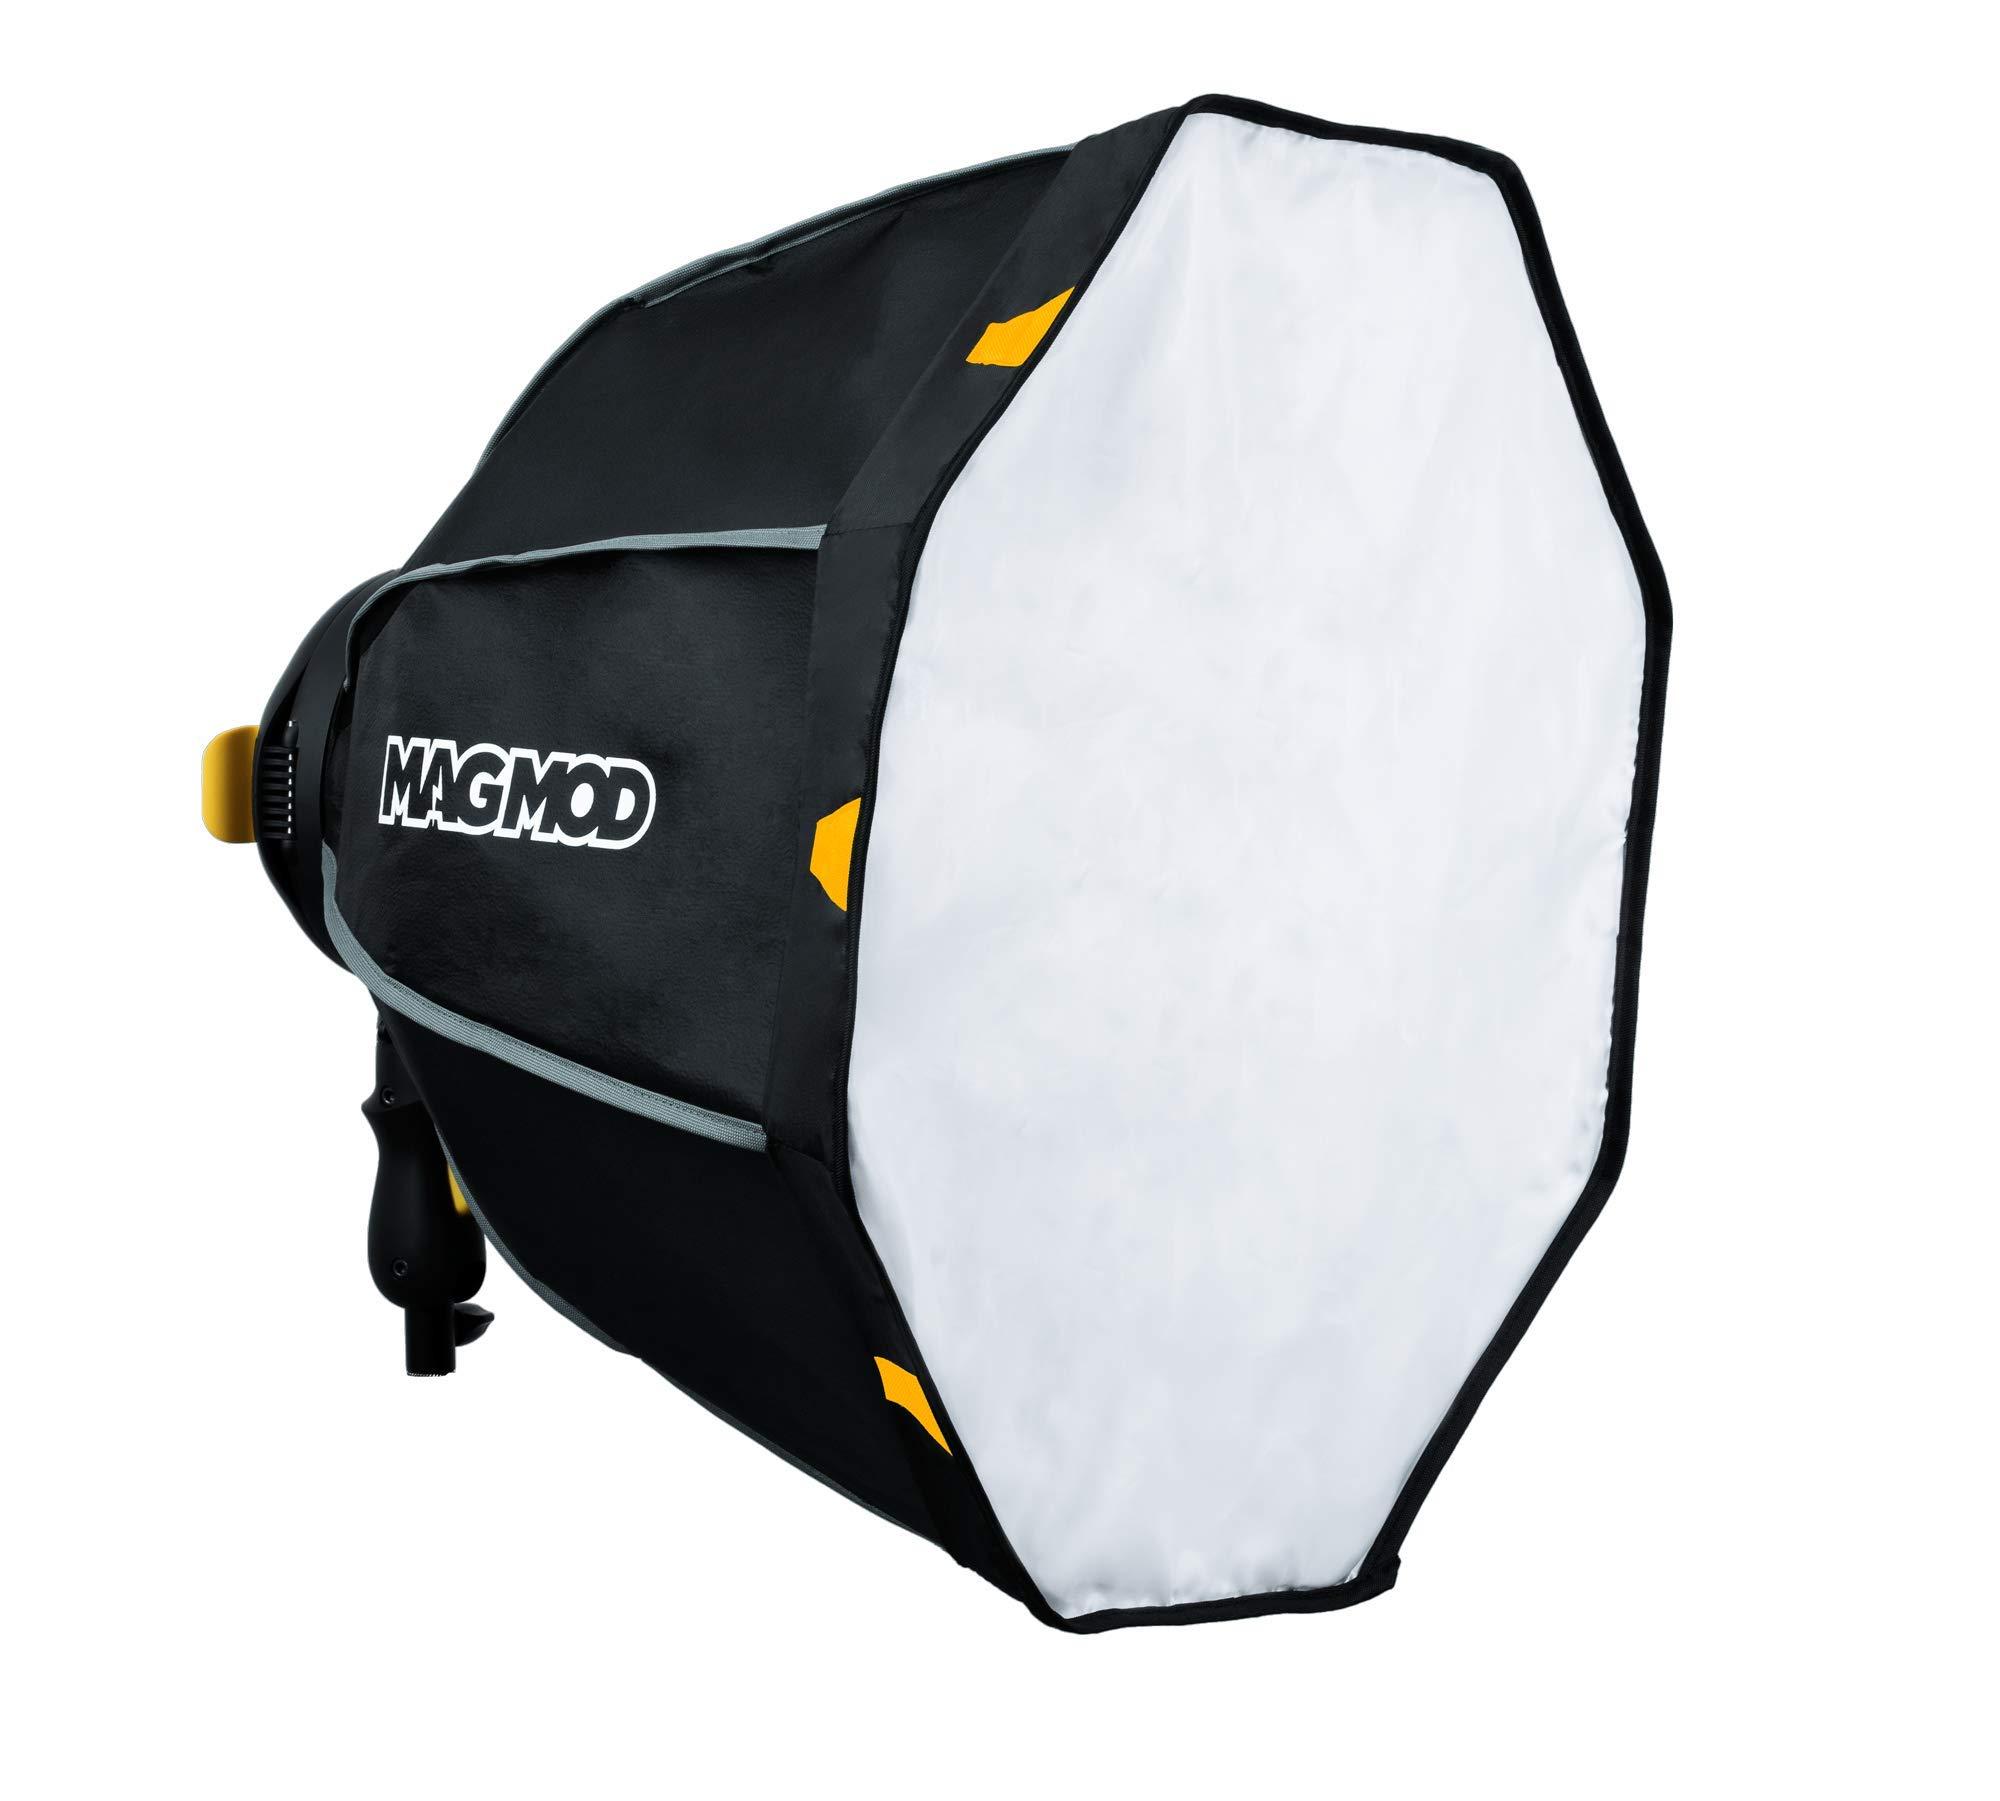 MagBox 24'' Octa Starter Kit by MagMod